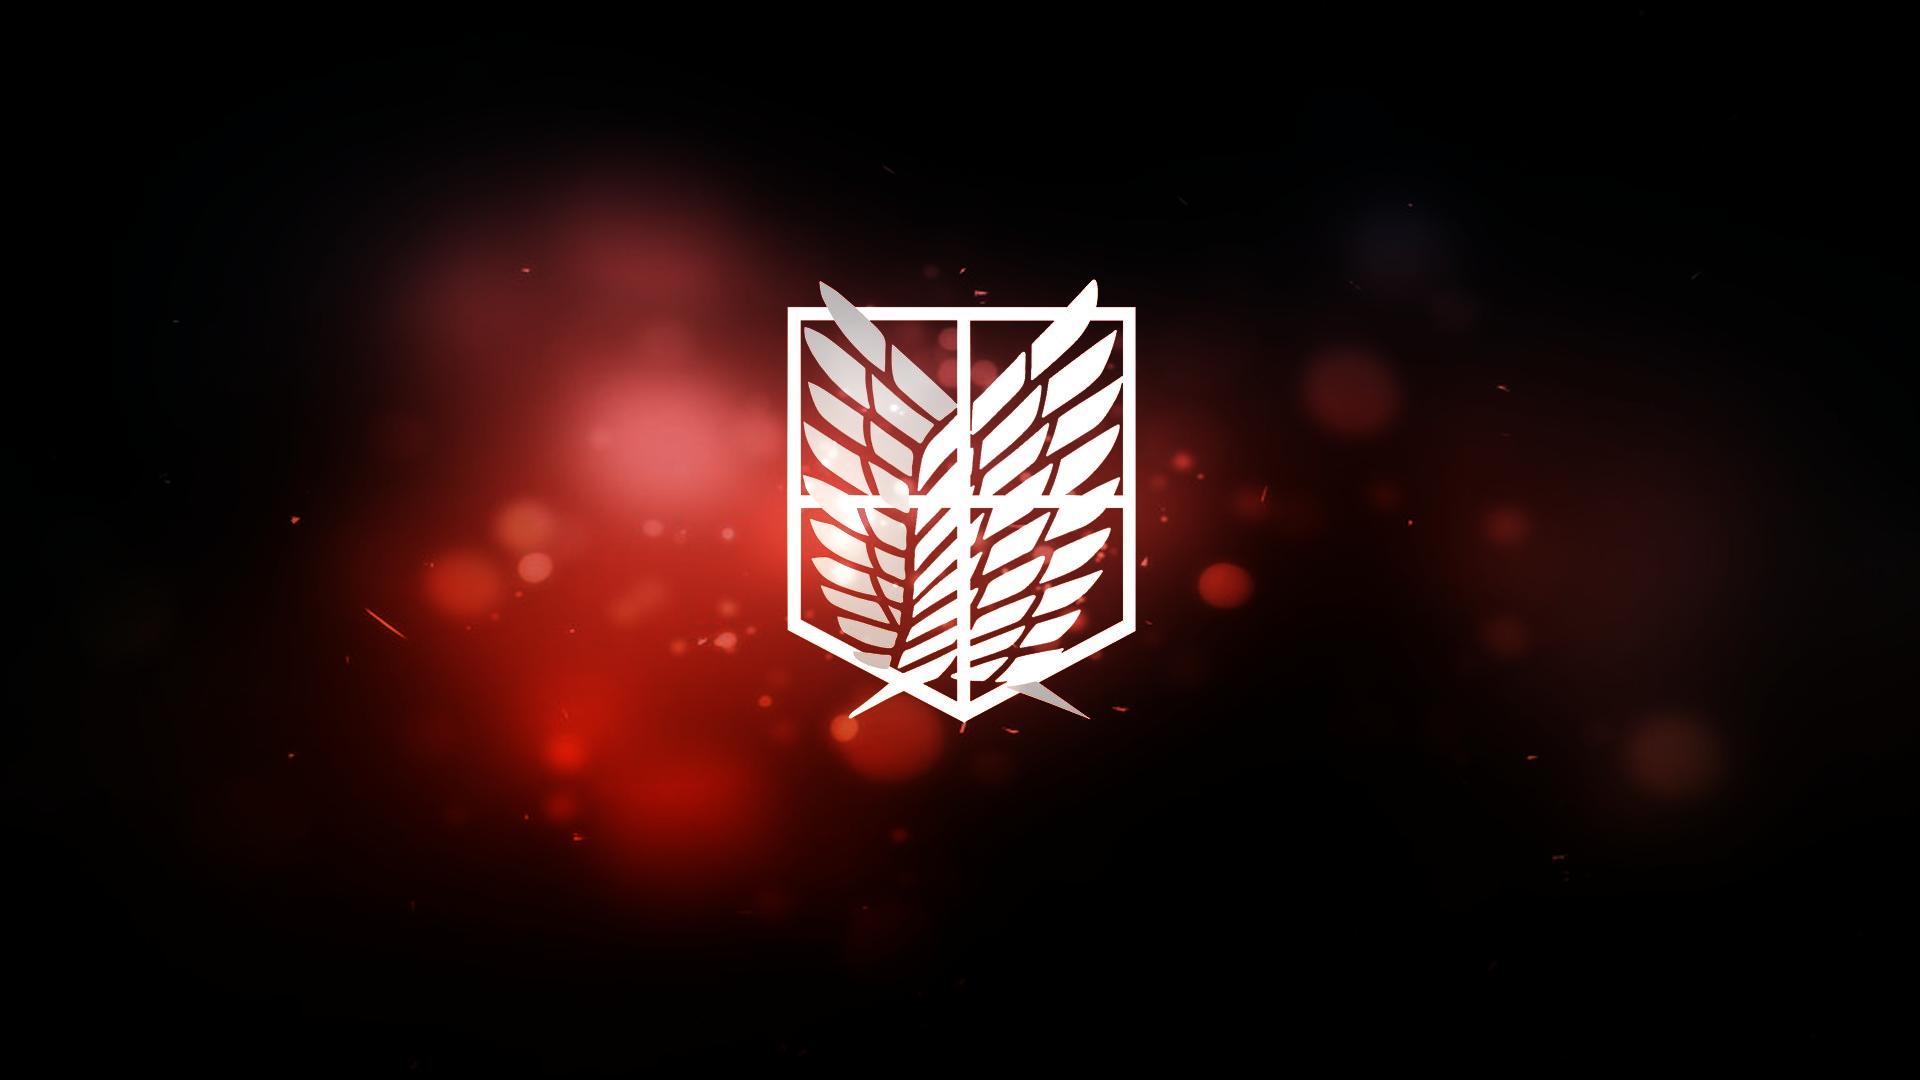 Anime Attack On Titan Emblem Scouting Legion Wallpaper